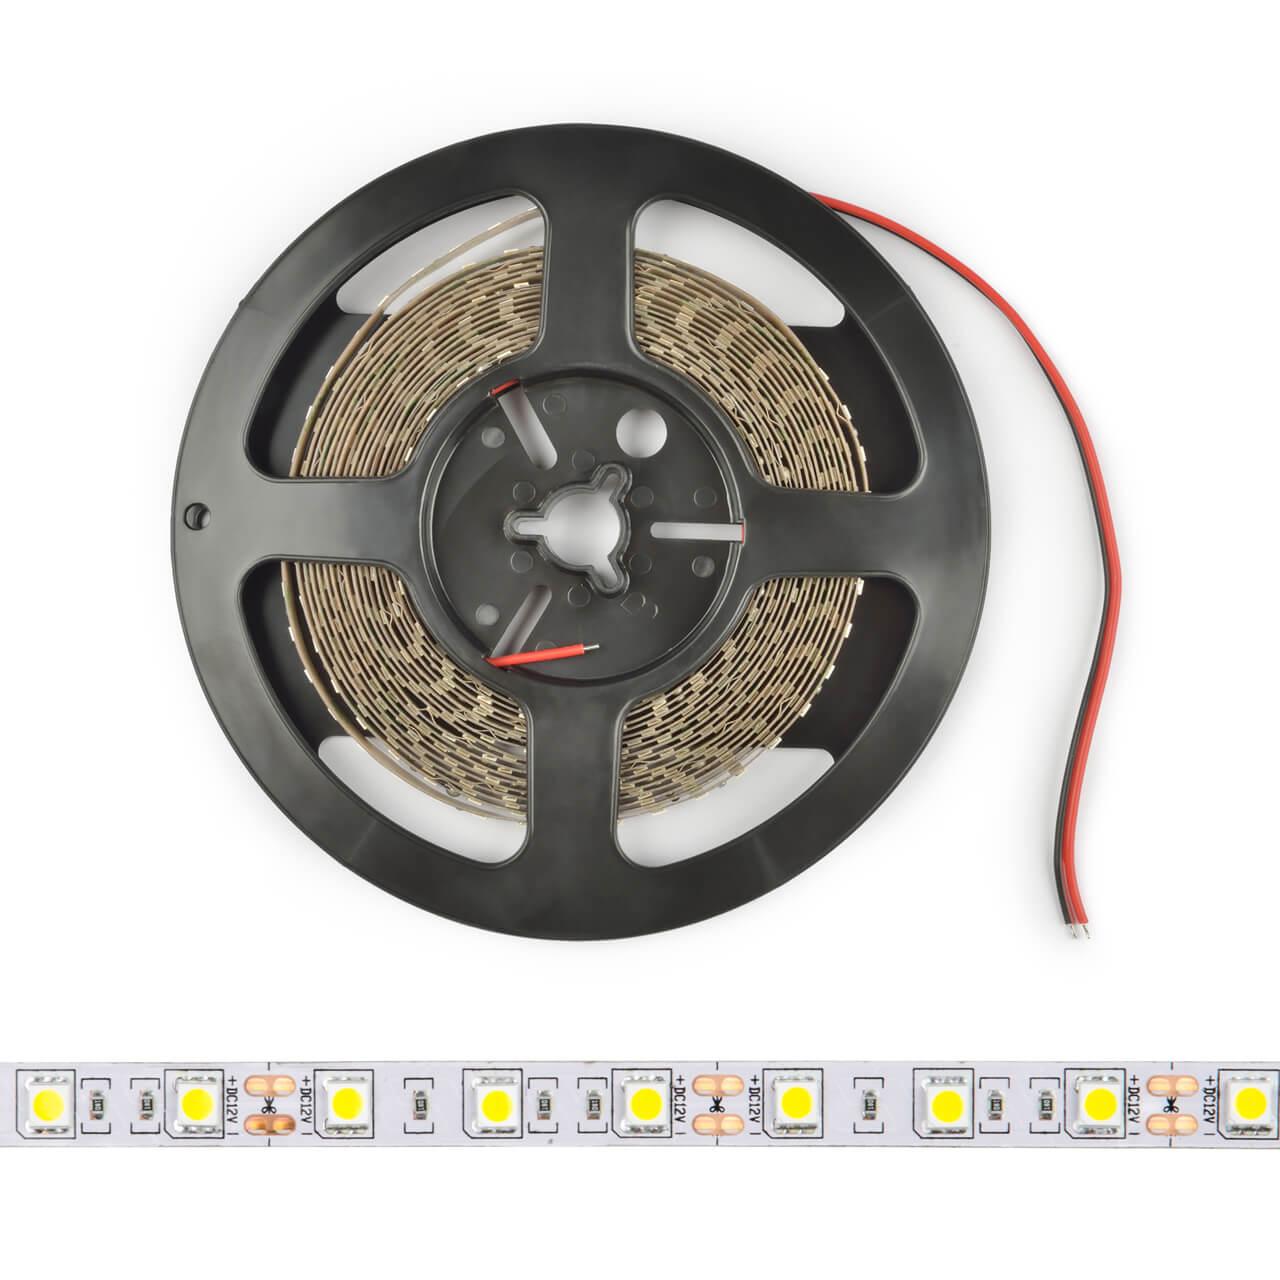 купить Светодиодная лента (UL-00004375) Uniel 14,4W/m 60LED/m 5050SMD RGB 5M ULS-M25-5050-60LED/m-10mm-IP20-DC12V-14,4W/m-5M-RGB PROFI дешево